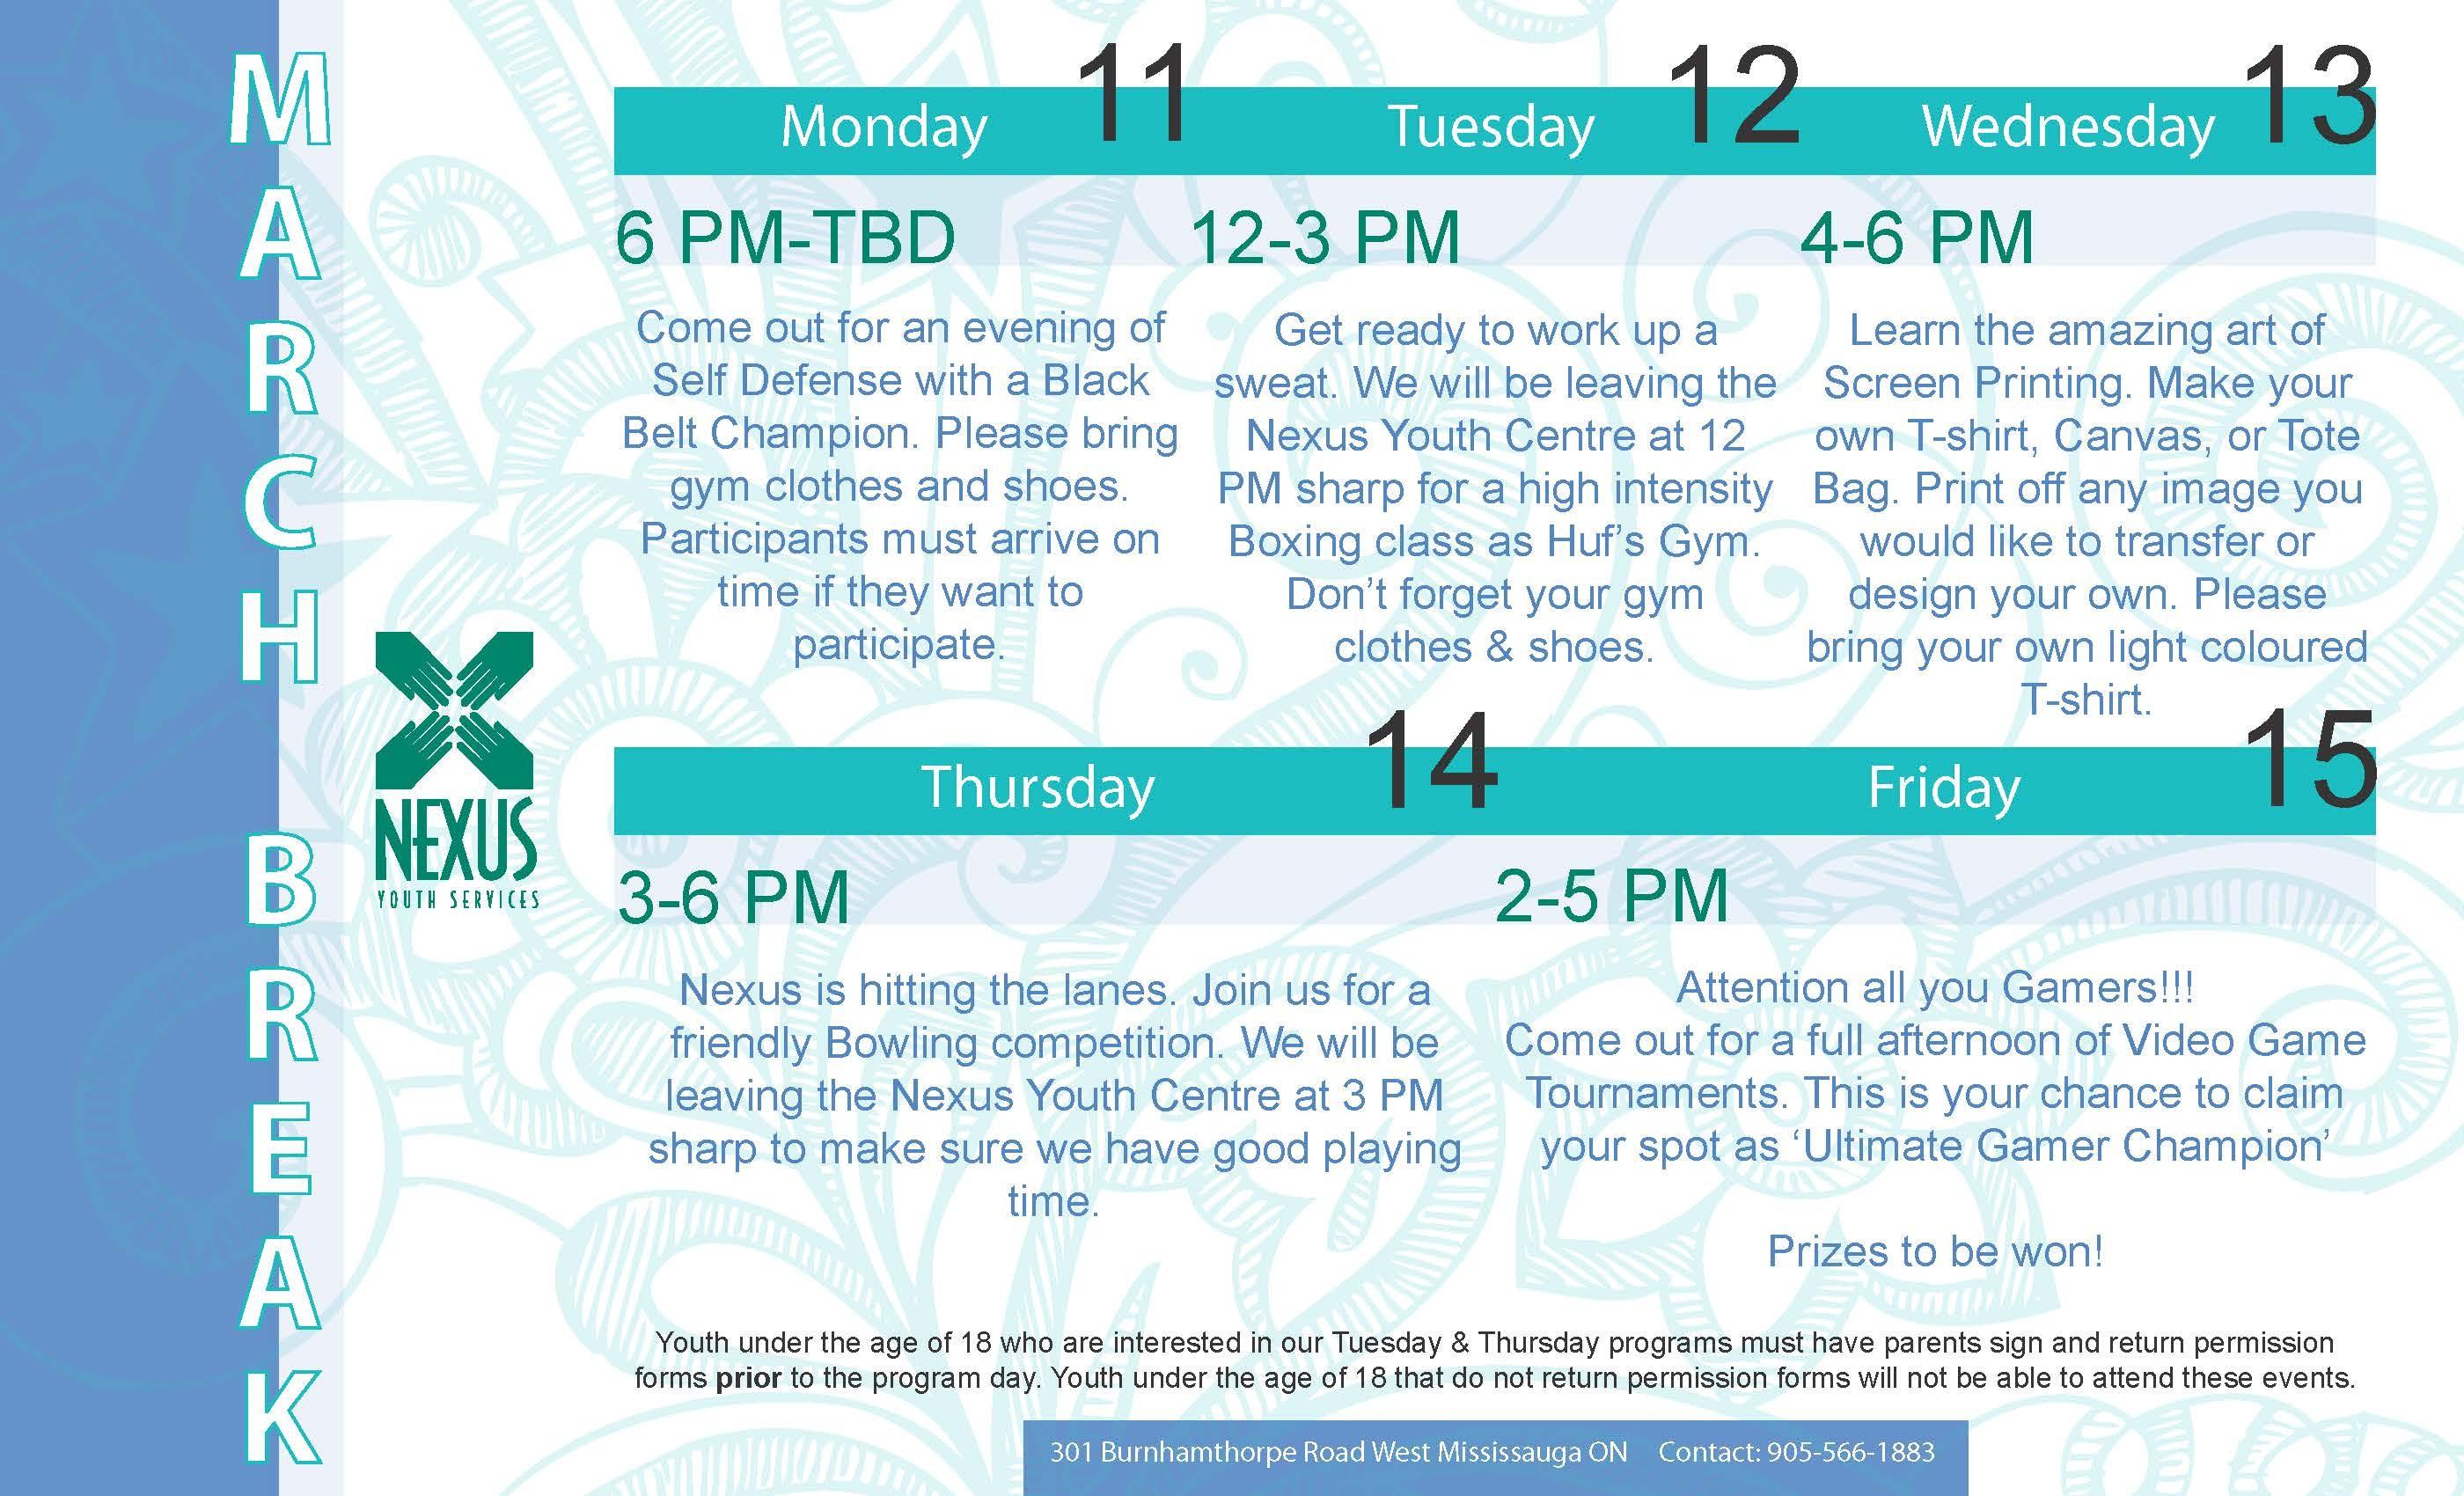 March Break 2013 Calendar